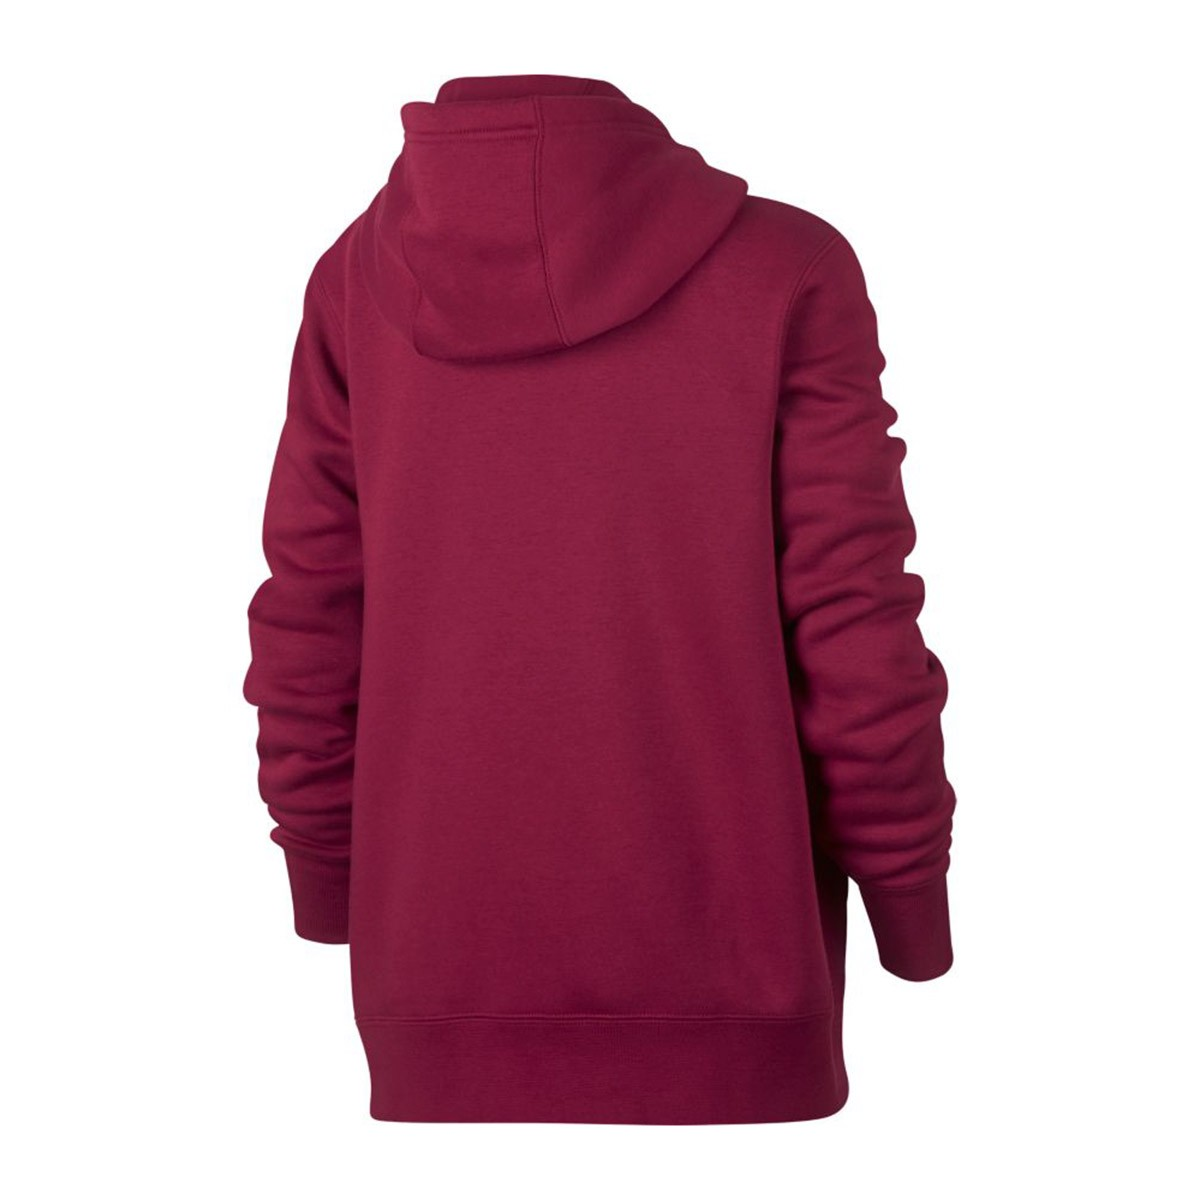 8a1efa73f Sweatshirt Nike Sportswear FC Barcelona Noble red-Deep royal blue ...